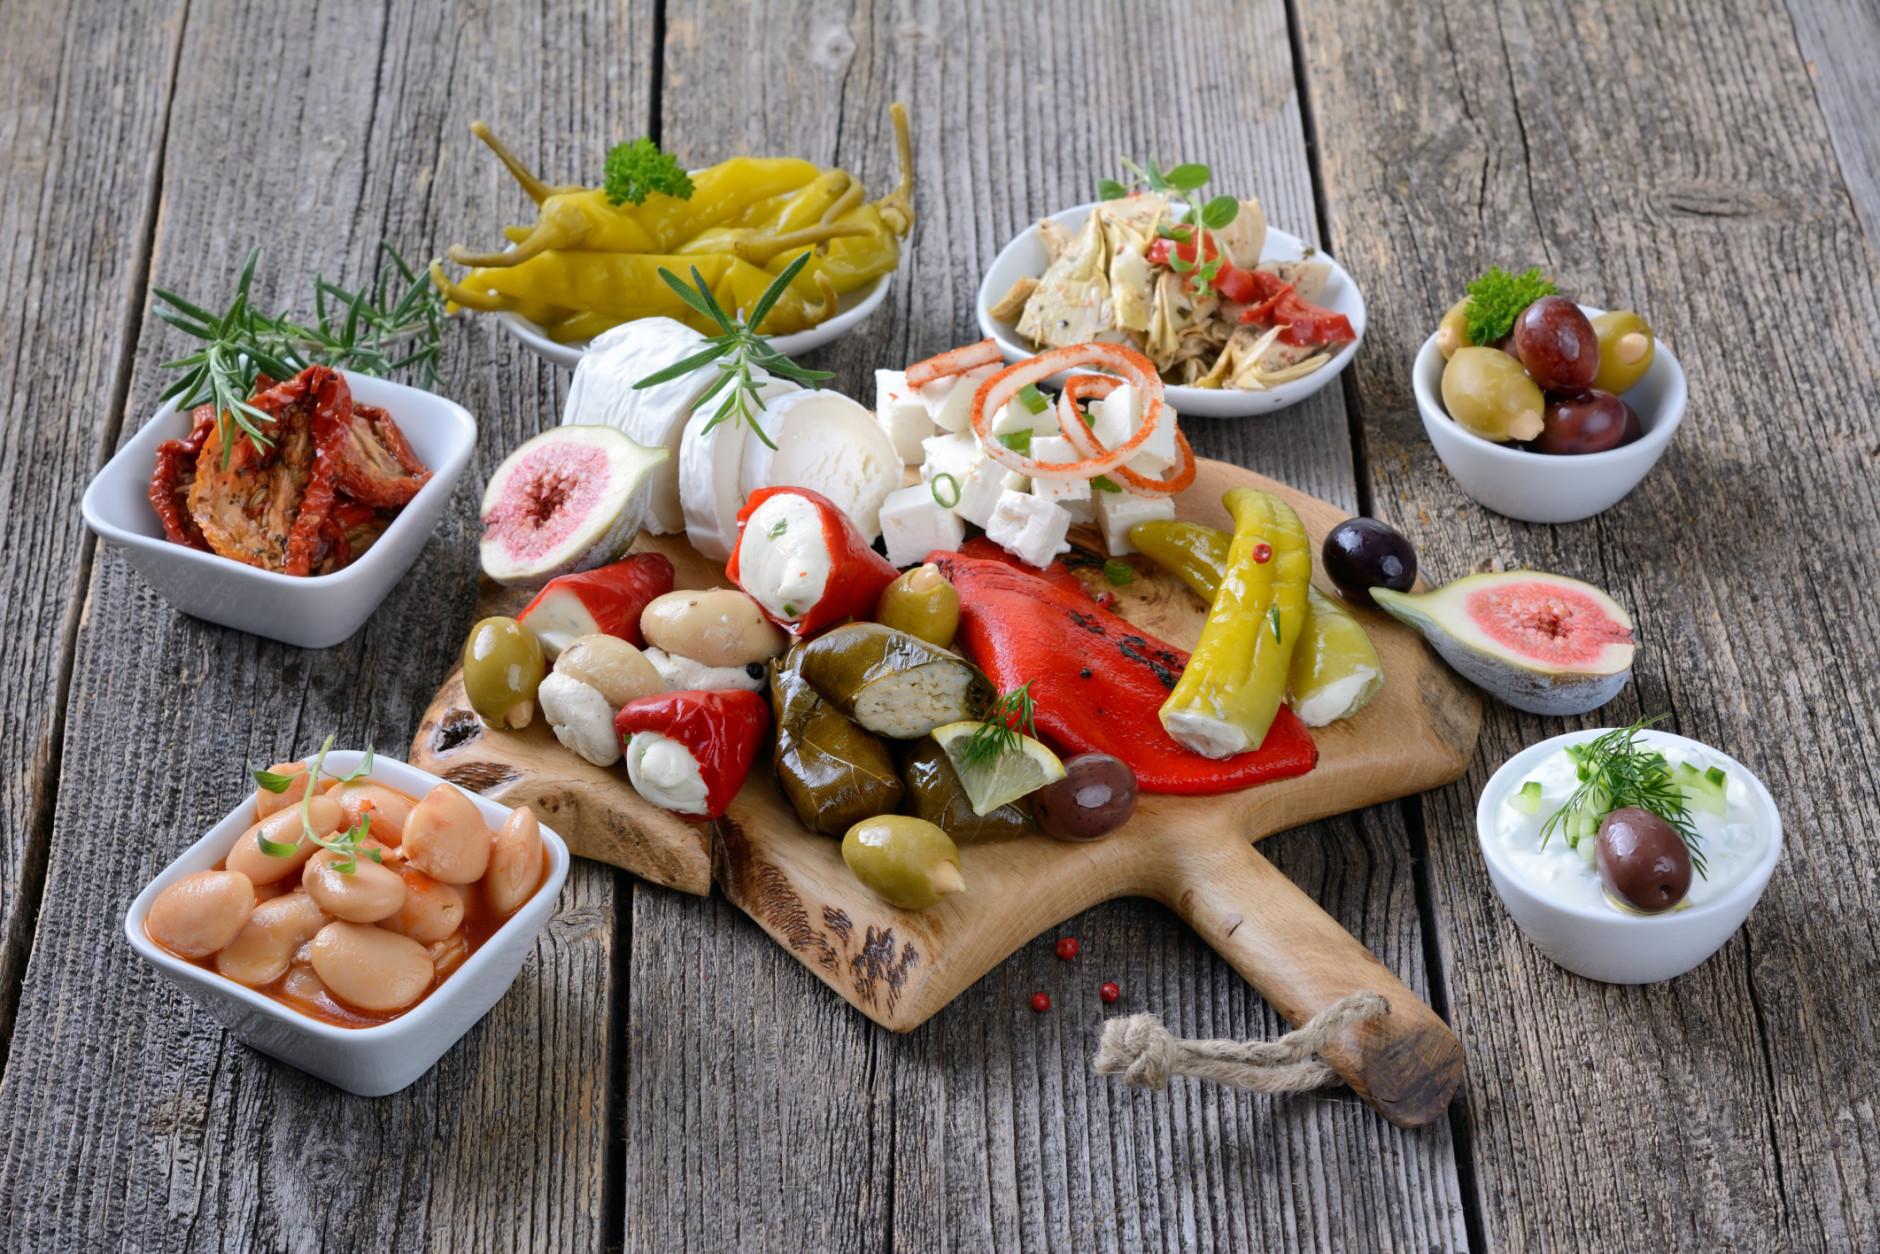 Mediterranean diet named best overall in new 2020 rankings